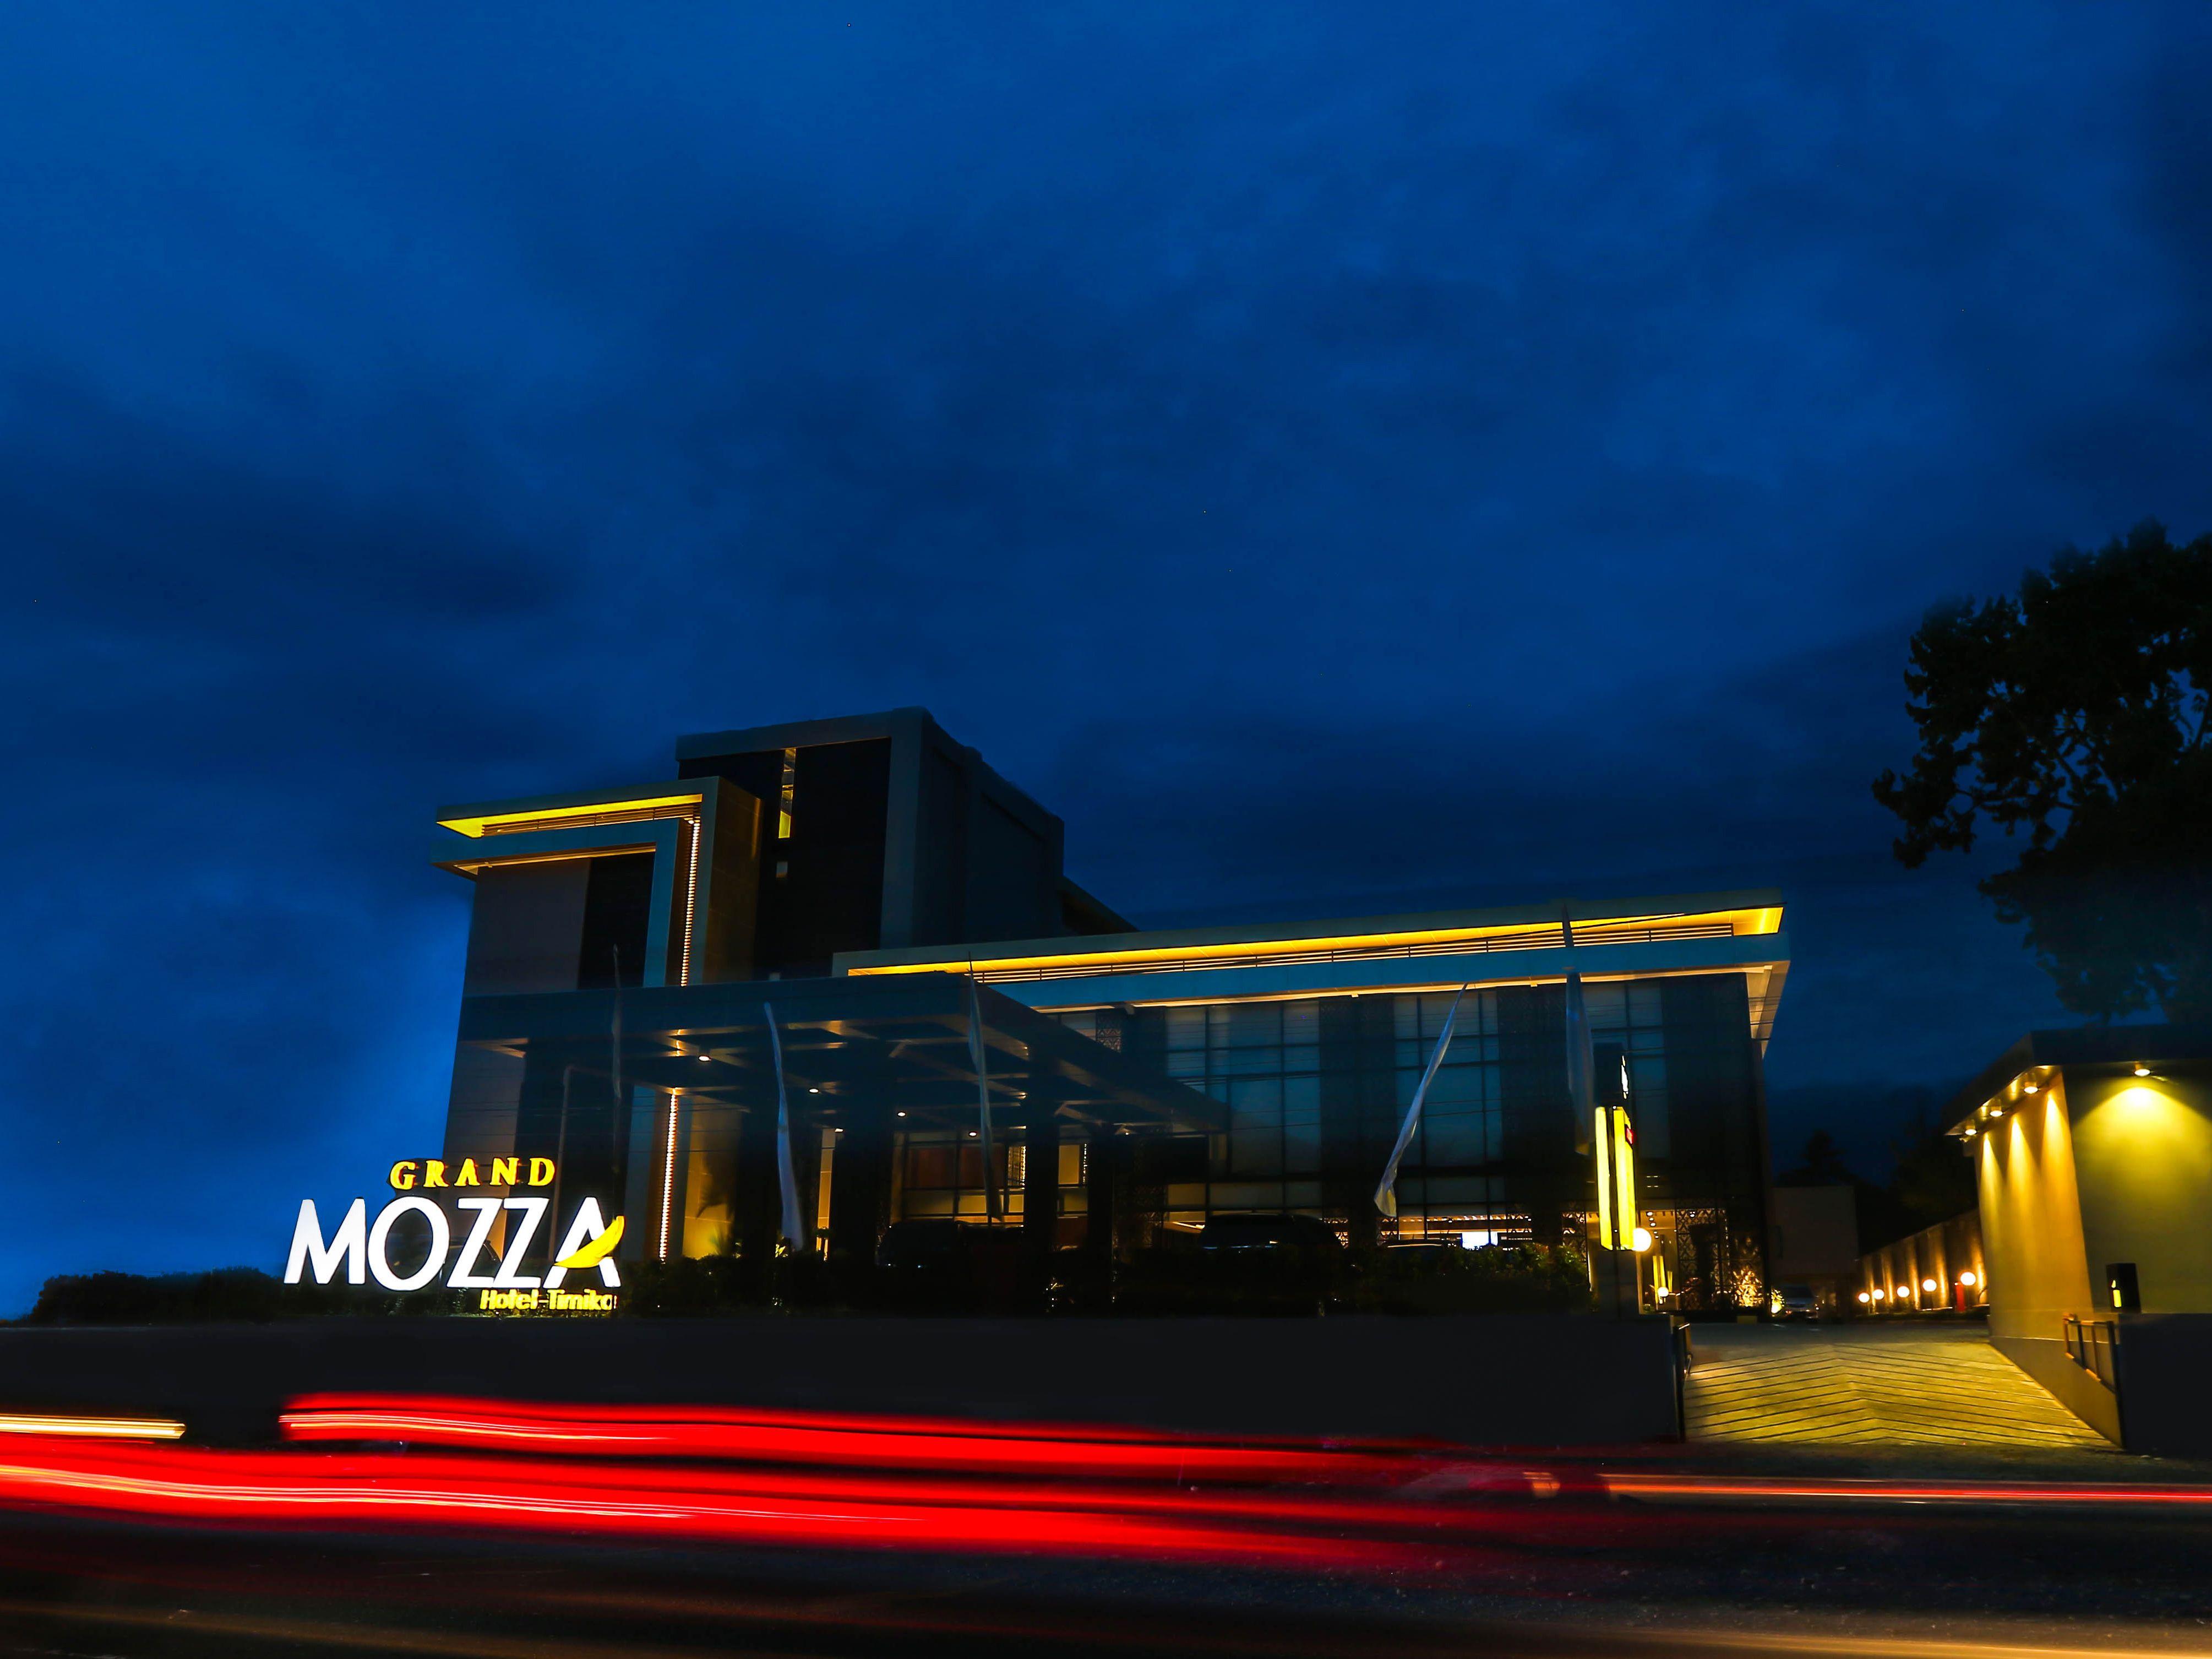 Grand Mozza Hotel Timika, Mimika